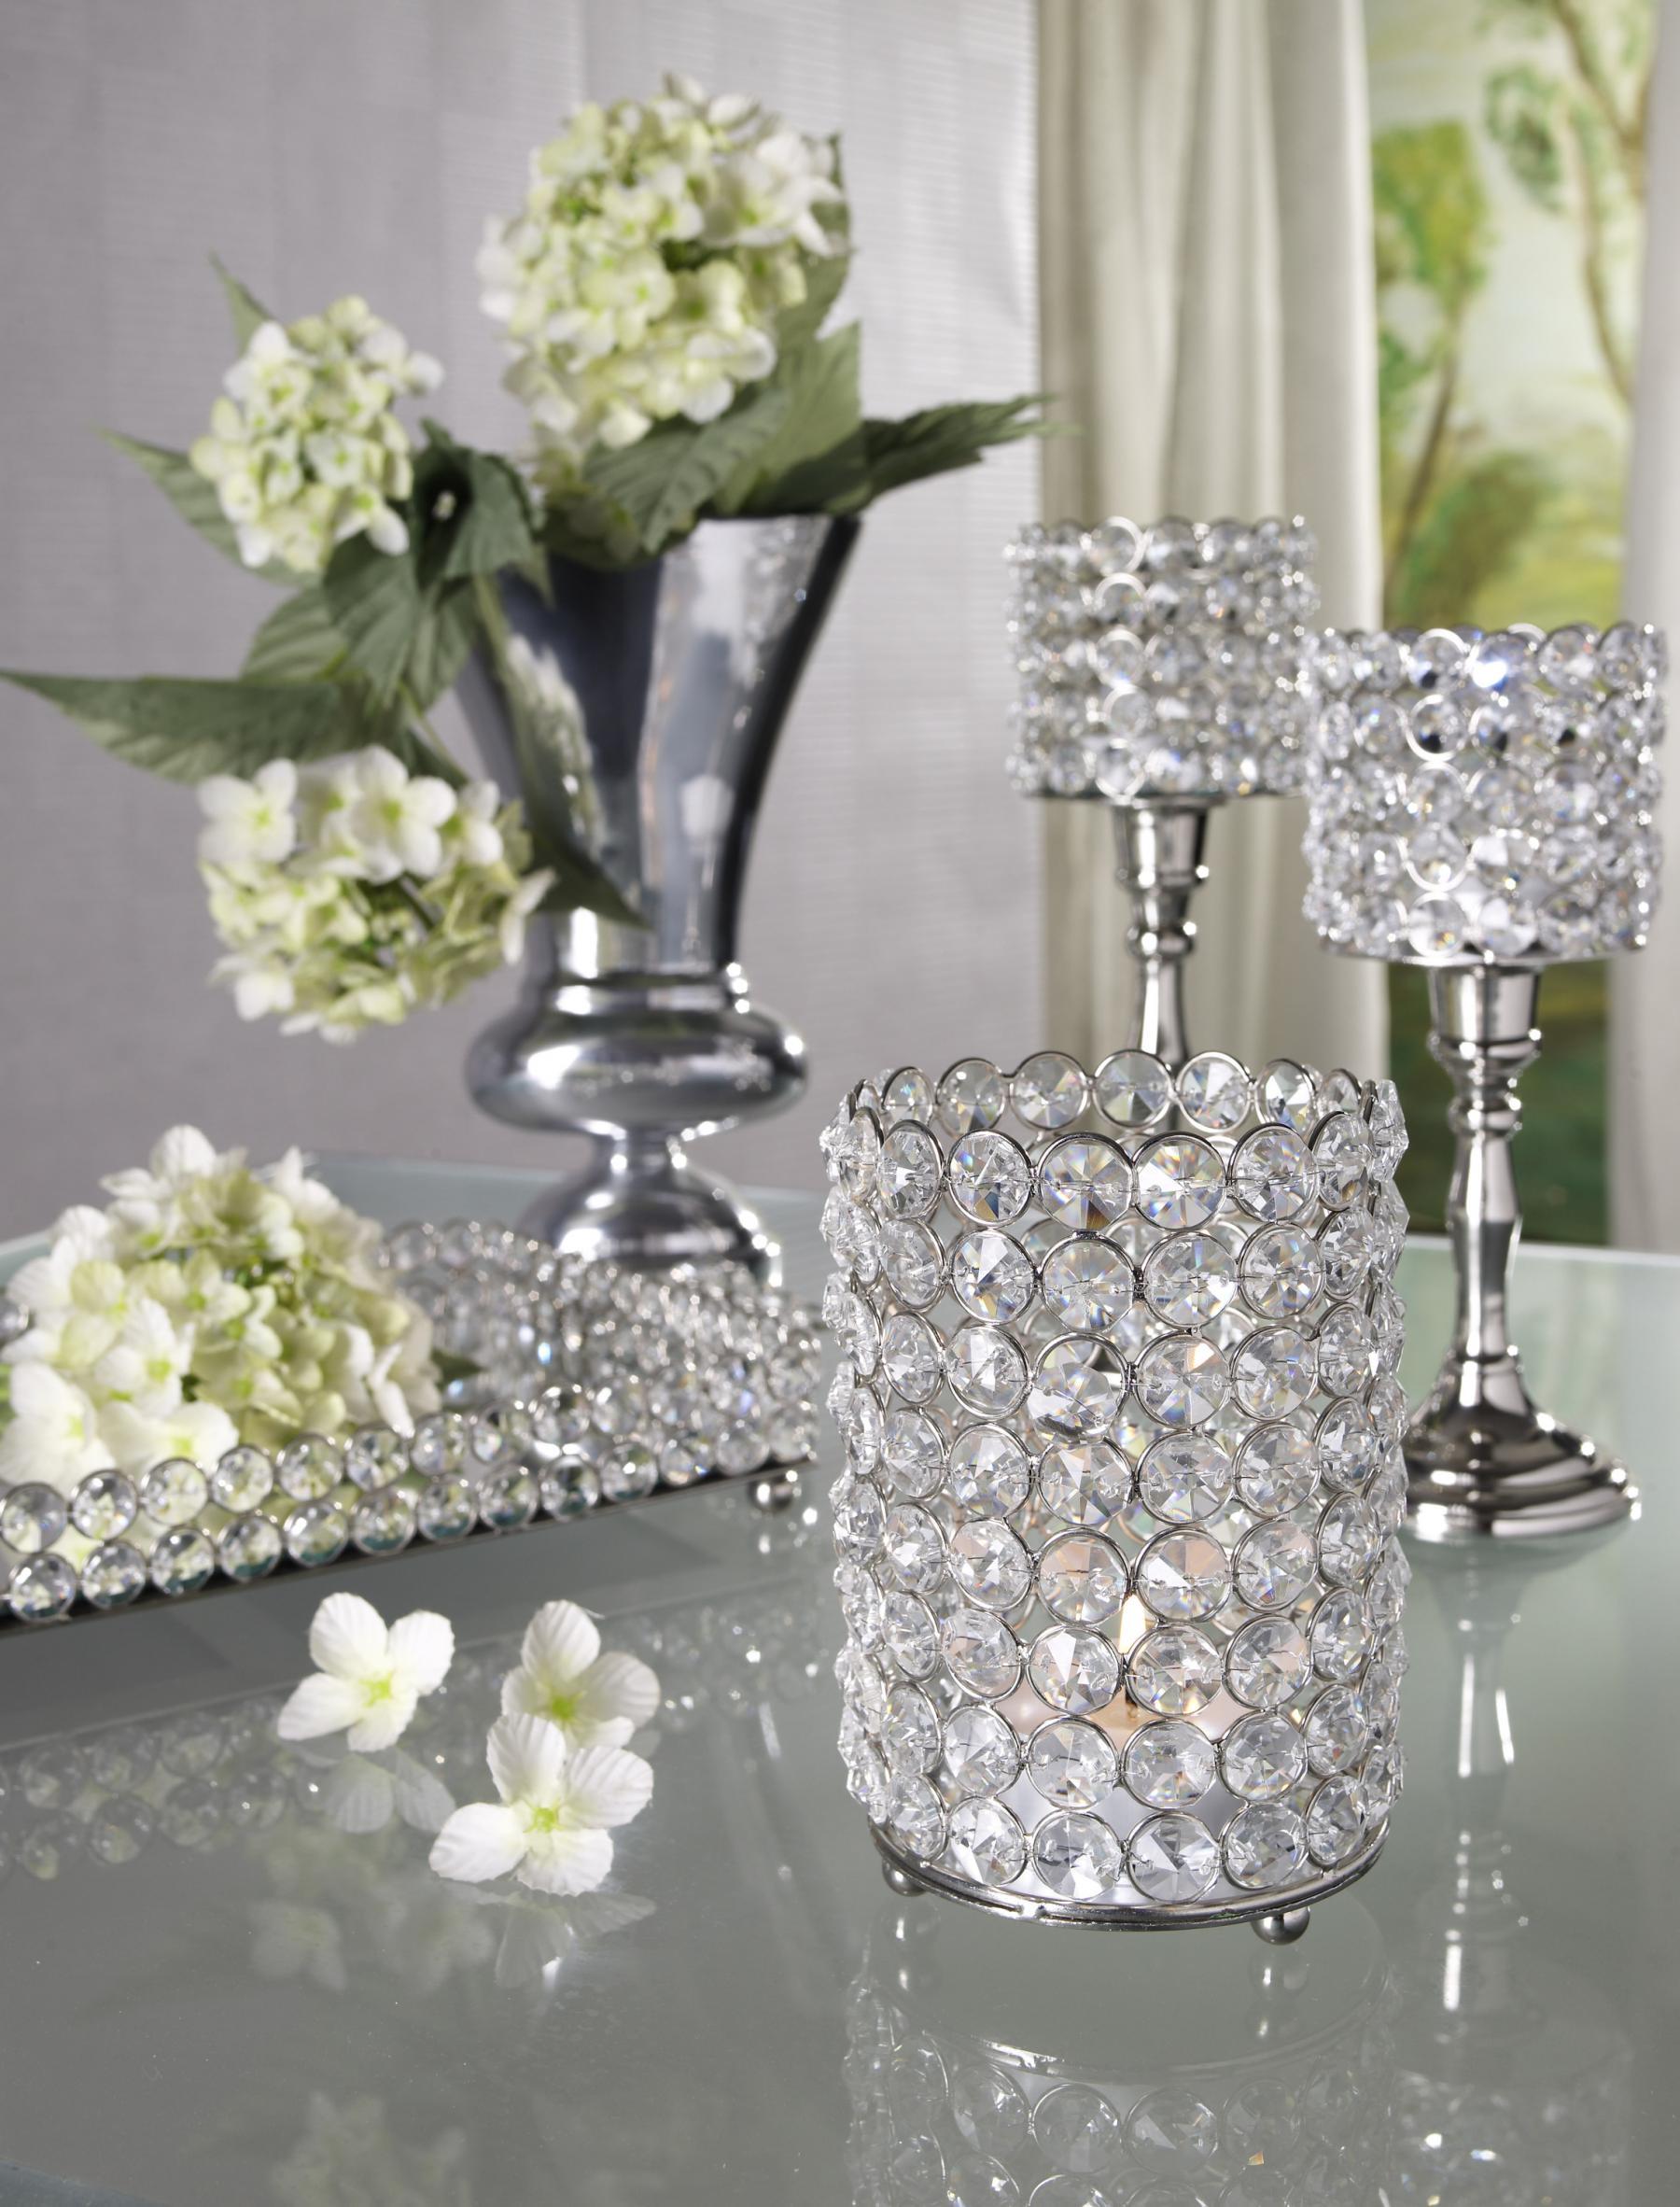 kristall kerzenst nder lucy silber aluminium und. Black Bedroom Furniture Sets. Home Design Ideas